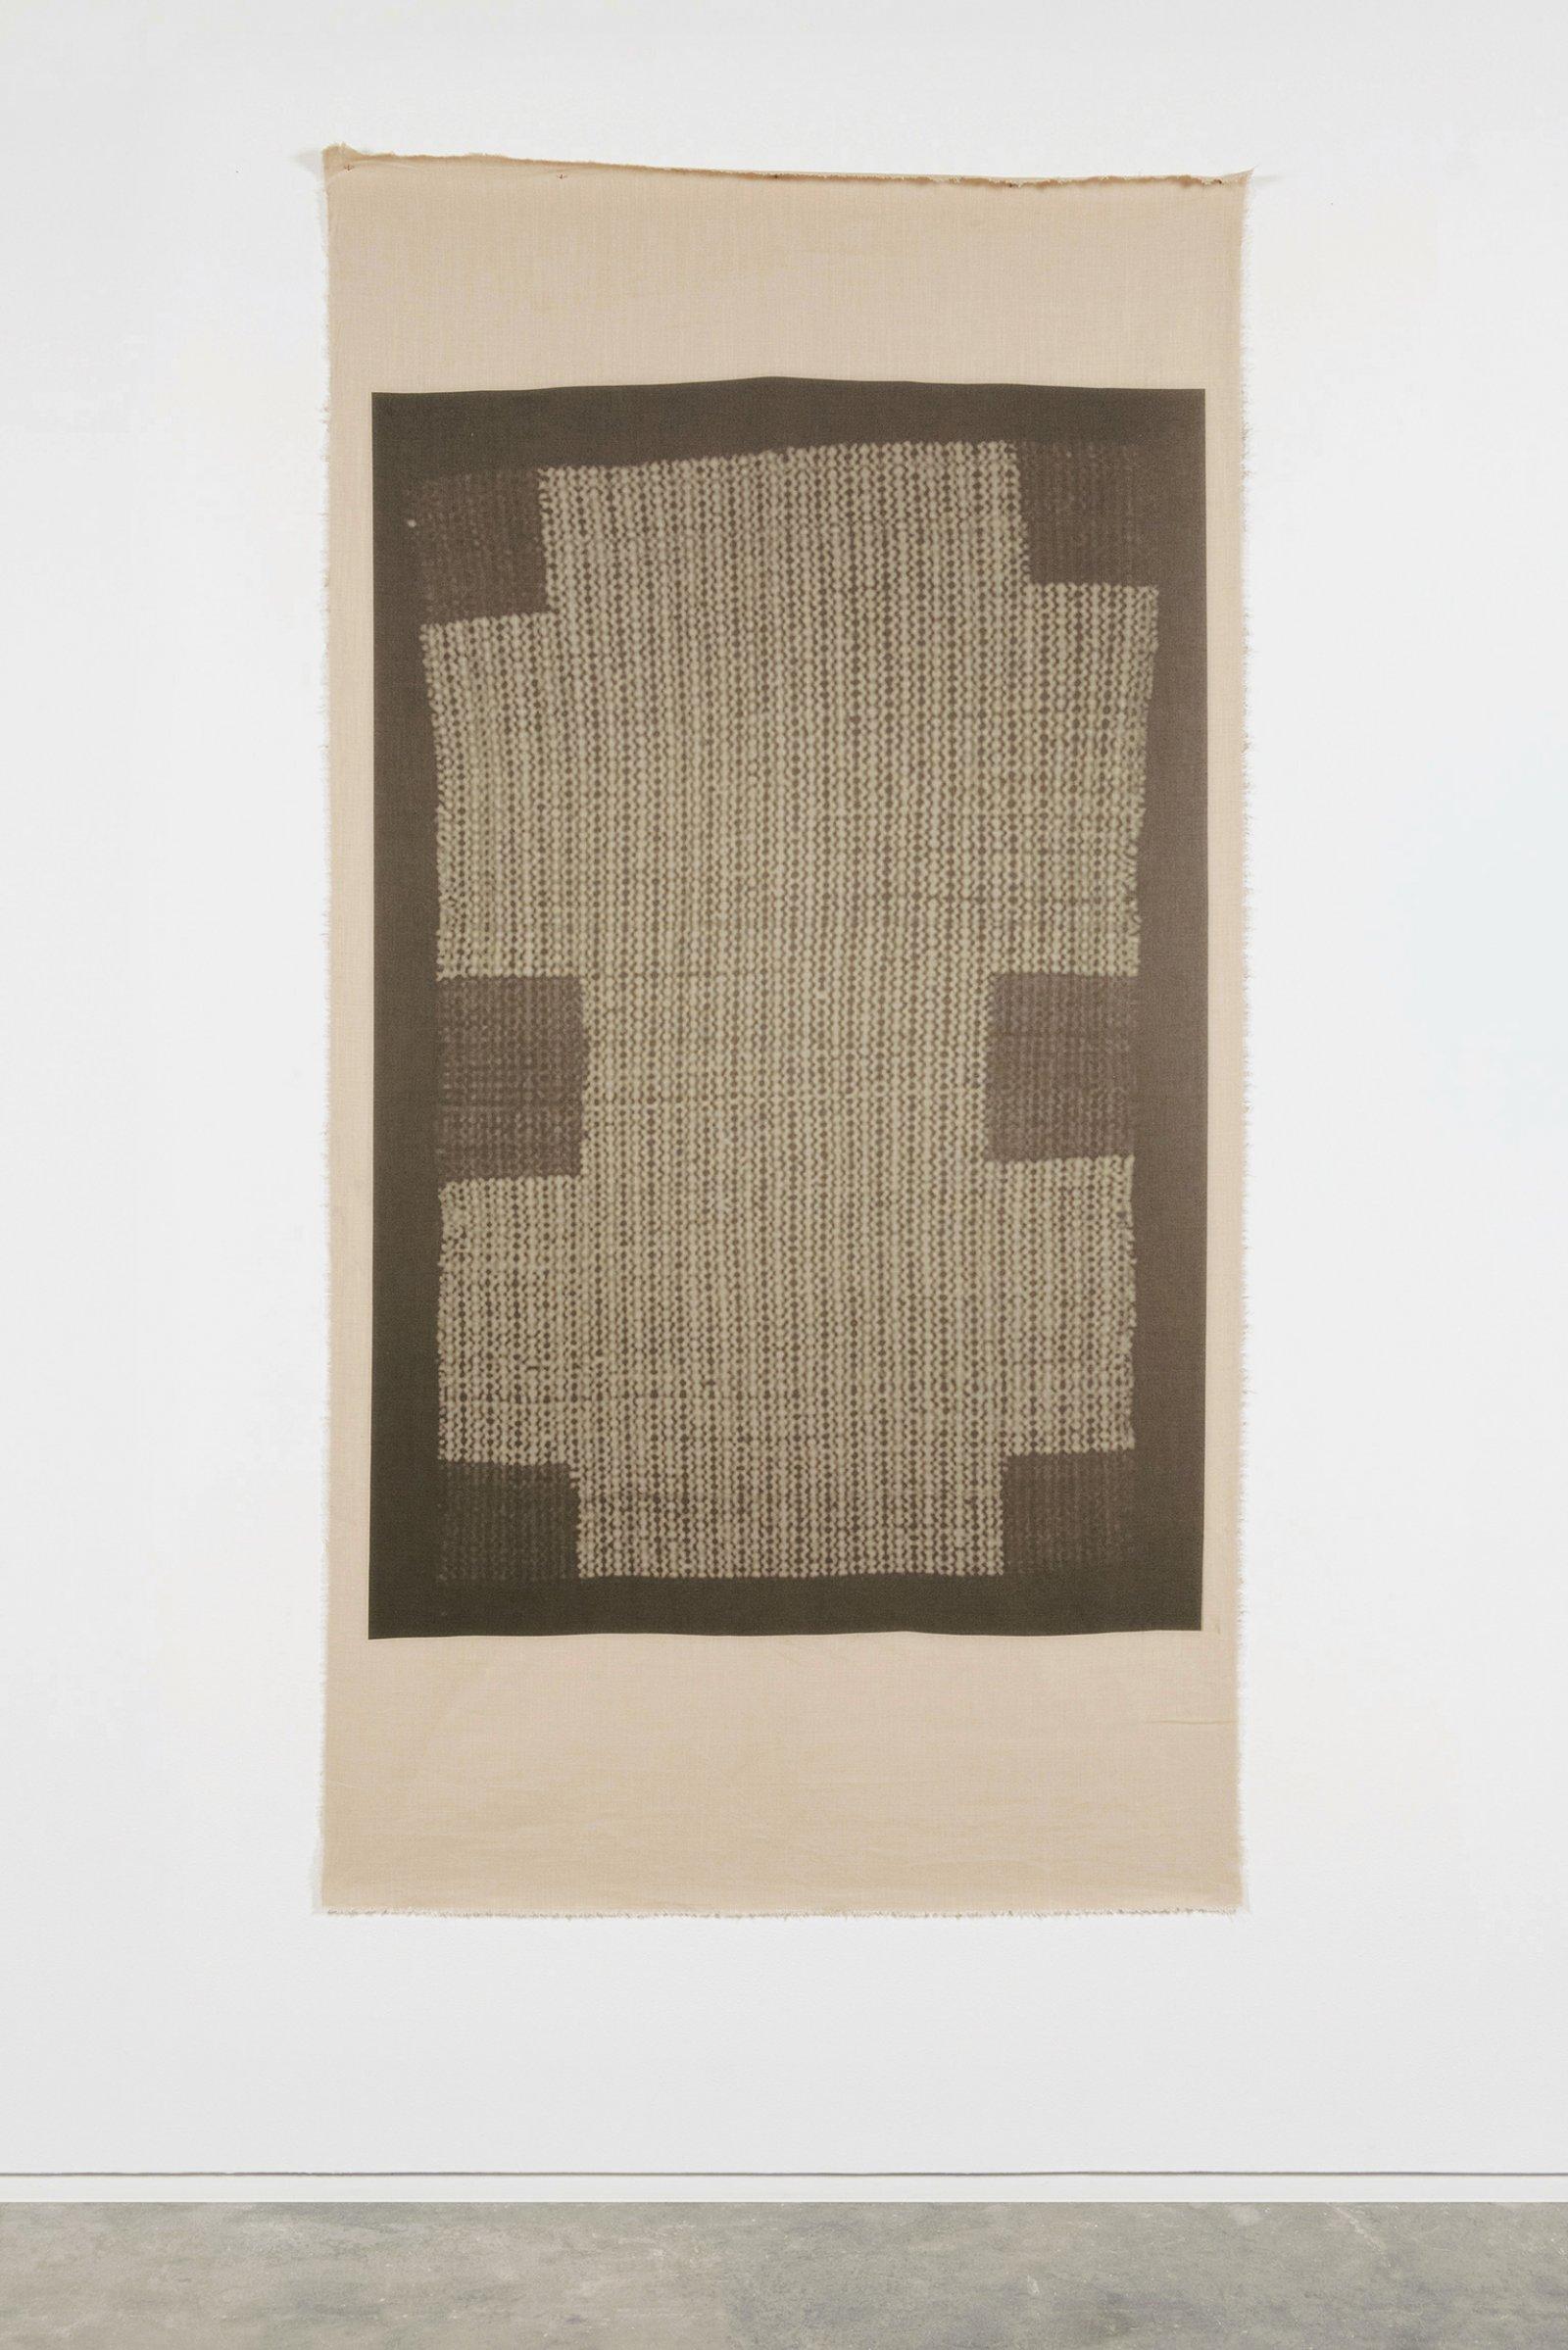 Duane Linklater,UMFA 1974.079.091.073, 2015, inkjet print on linen, nails, from Navajo Saddle Blanket, Utah Museum of Fine Arts Collection, 85 x 44 in. (216 x 112 cm)